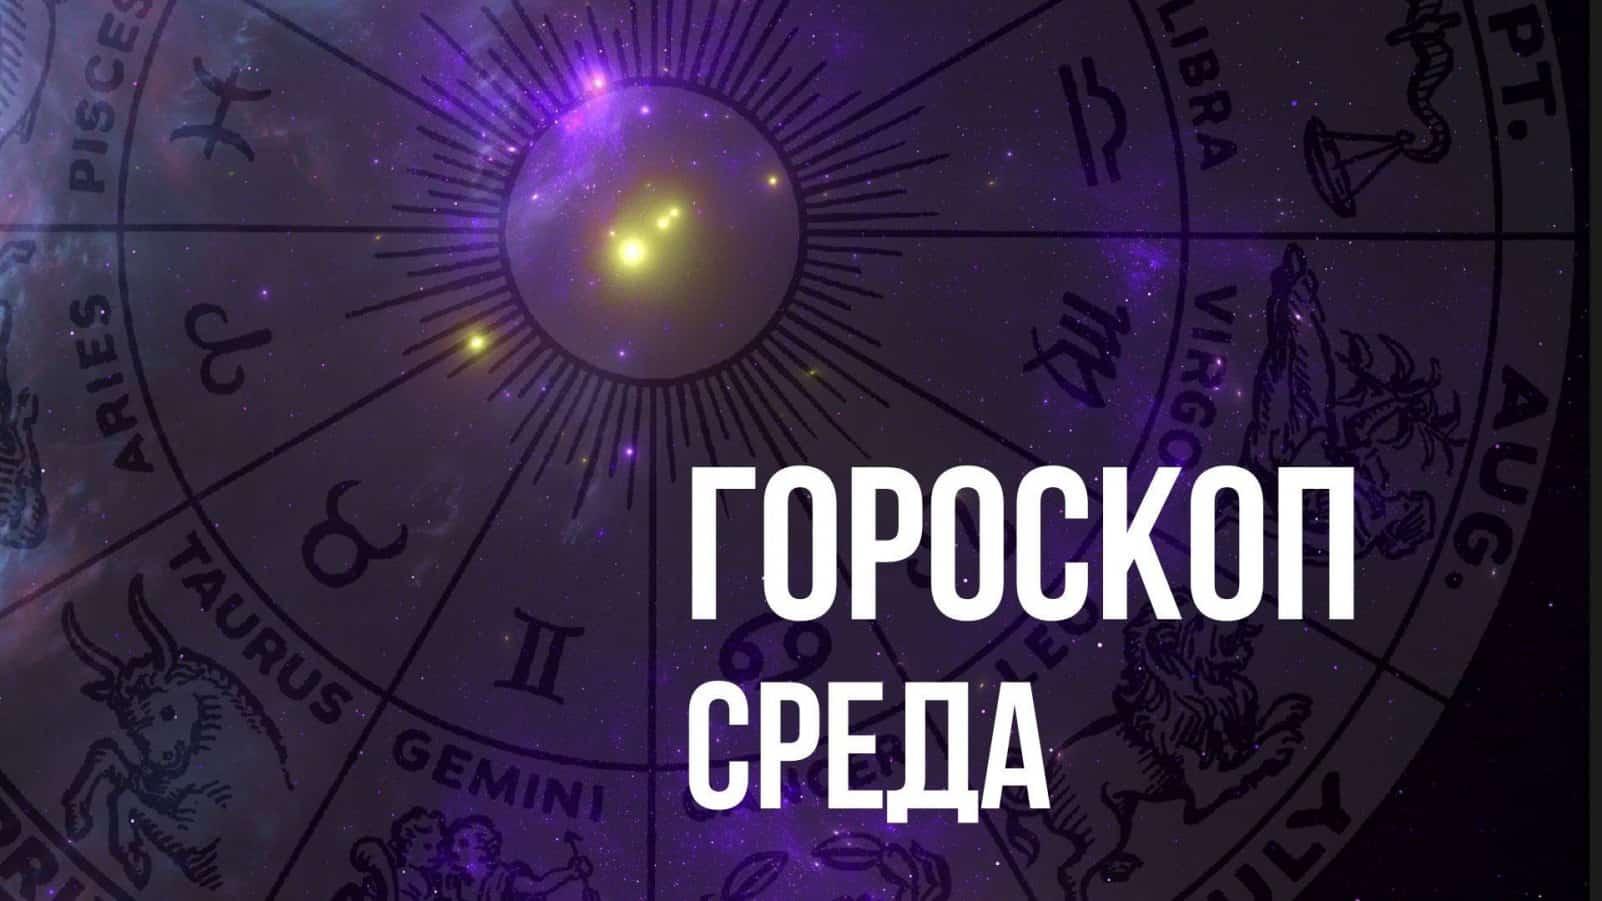 Гороскоп на среду 18 августа для каждого знака Зодиака